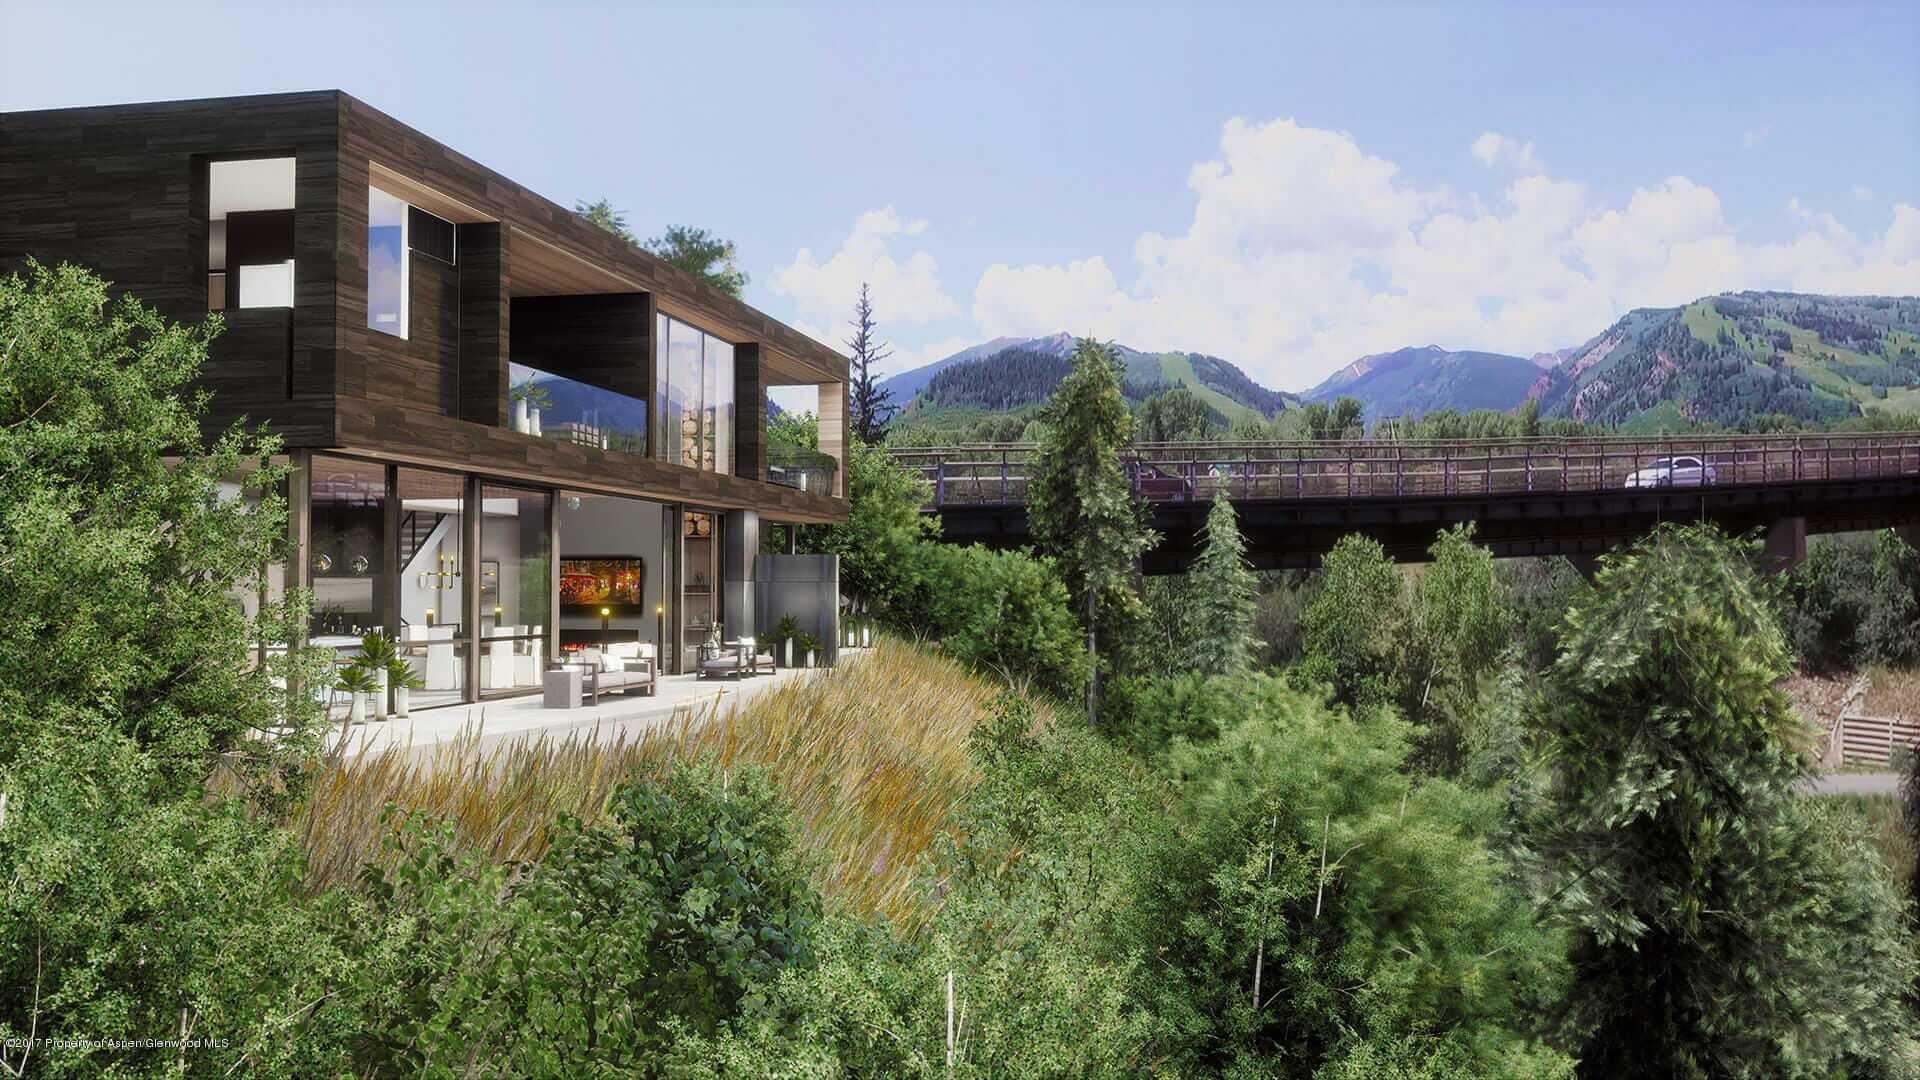 New 3-Home Development Project at Aspen's W. Hwy 82 Entry & Castle Creek Bridge Sells Image